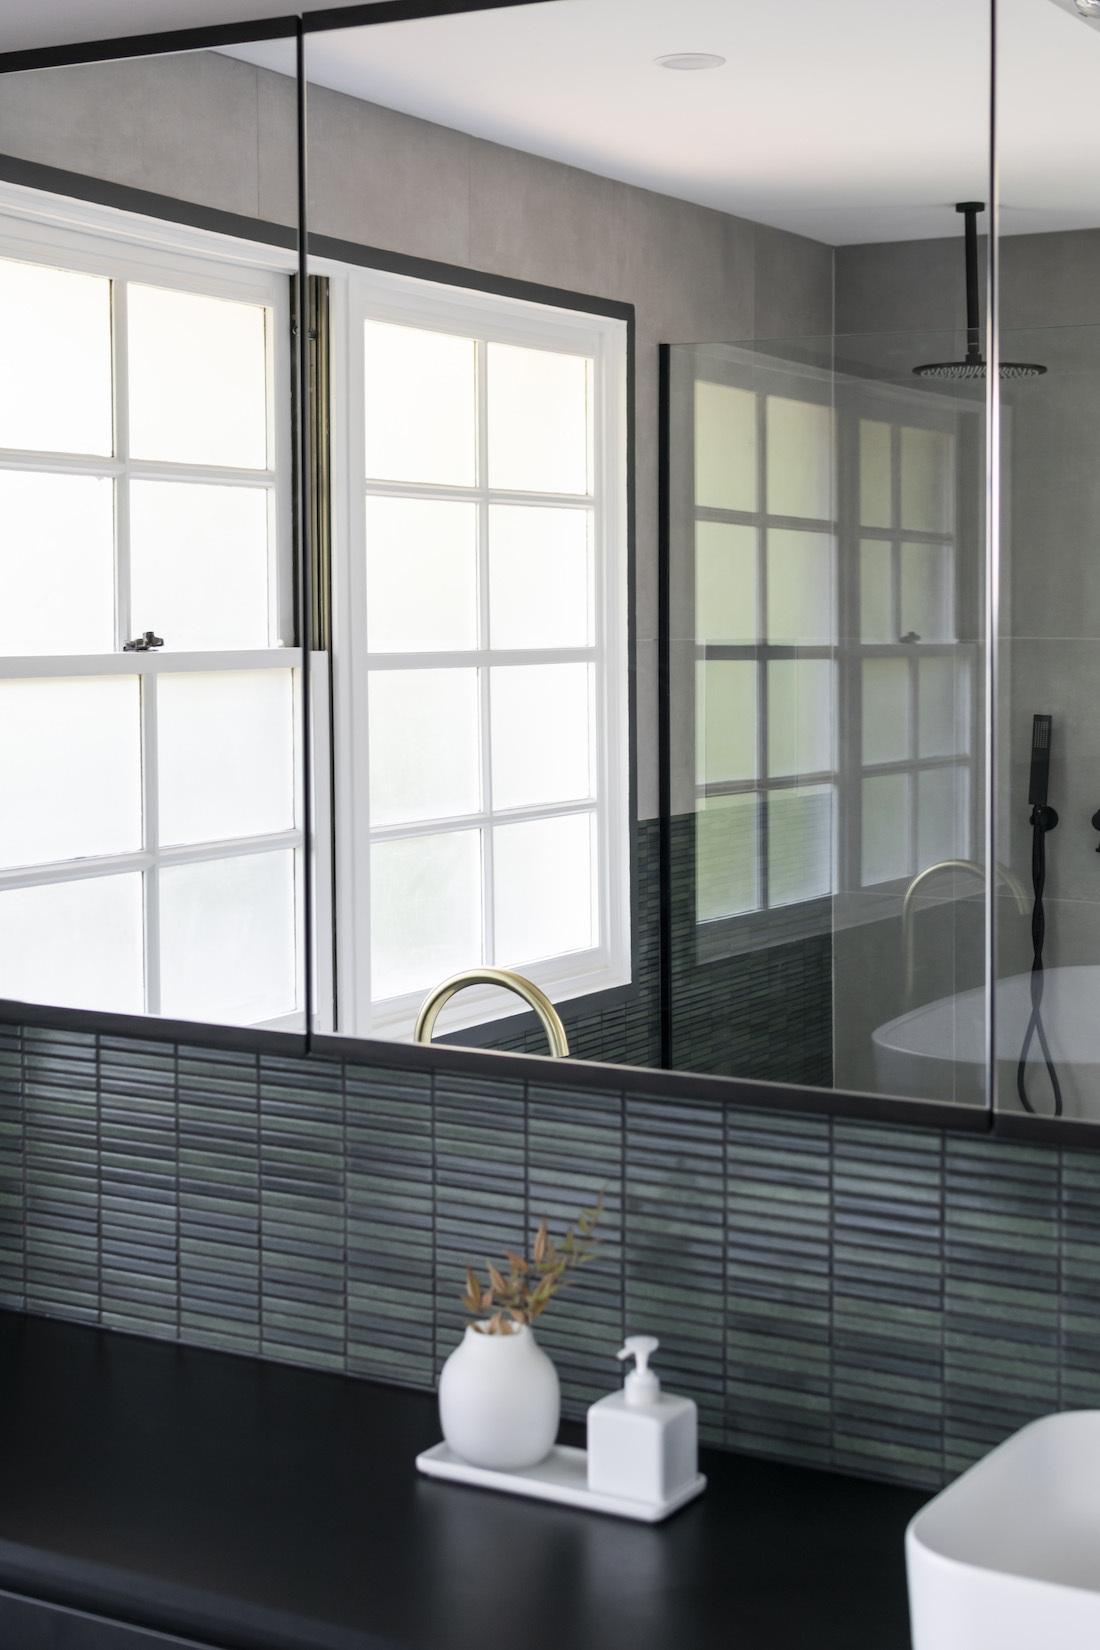 MorecombeHouse_BathroomMIrror